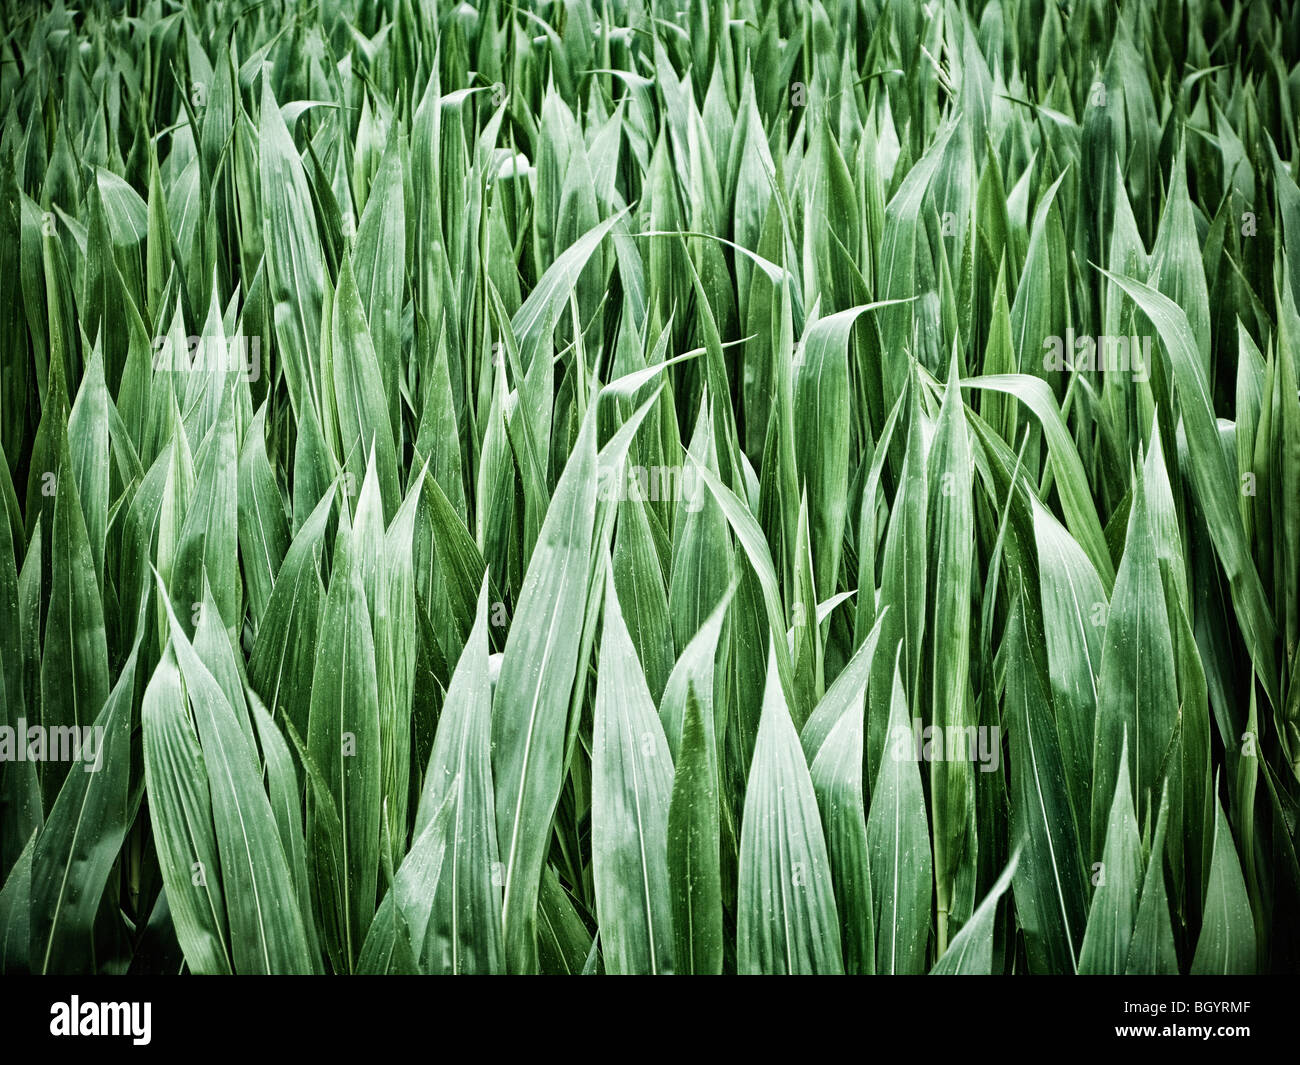 Les feuilles de maïs close up Photo Stock